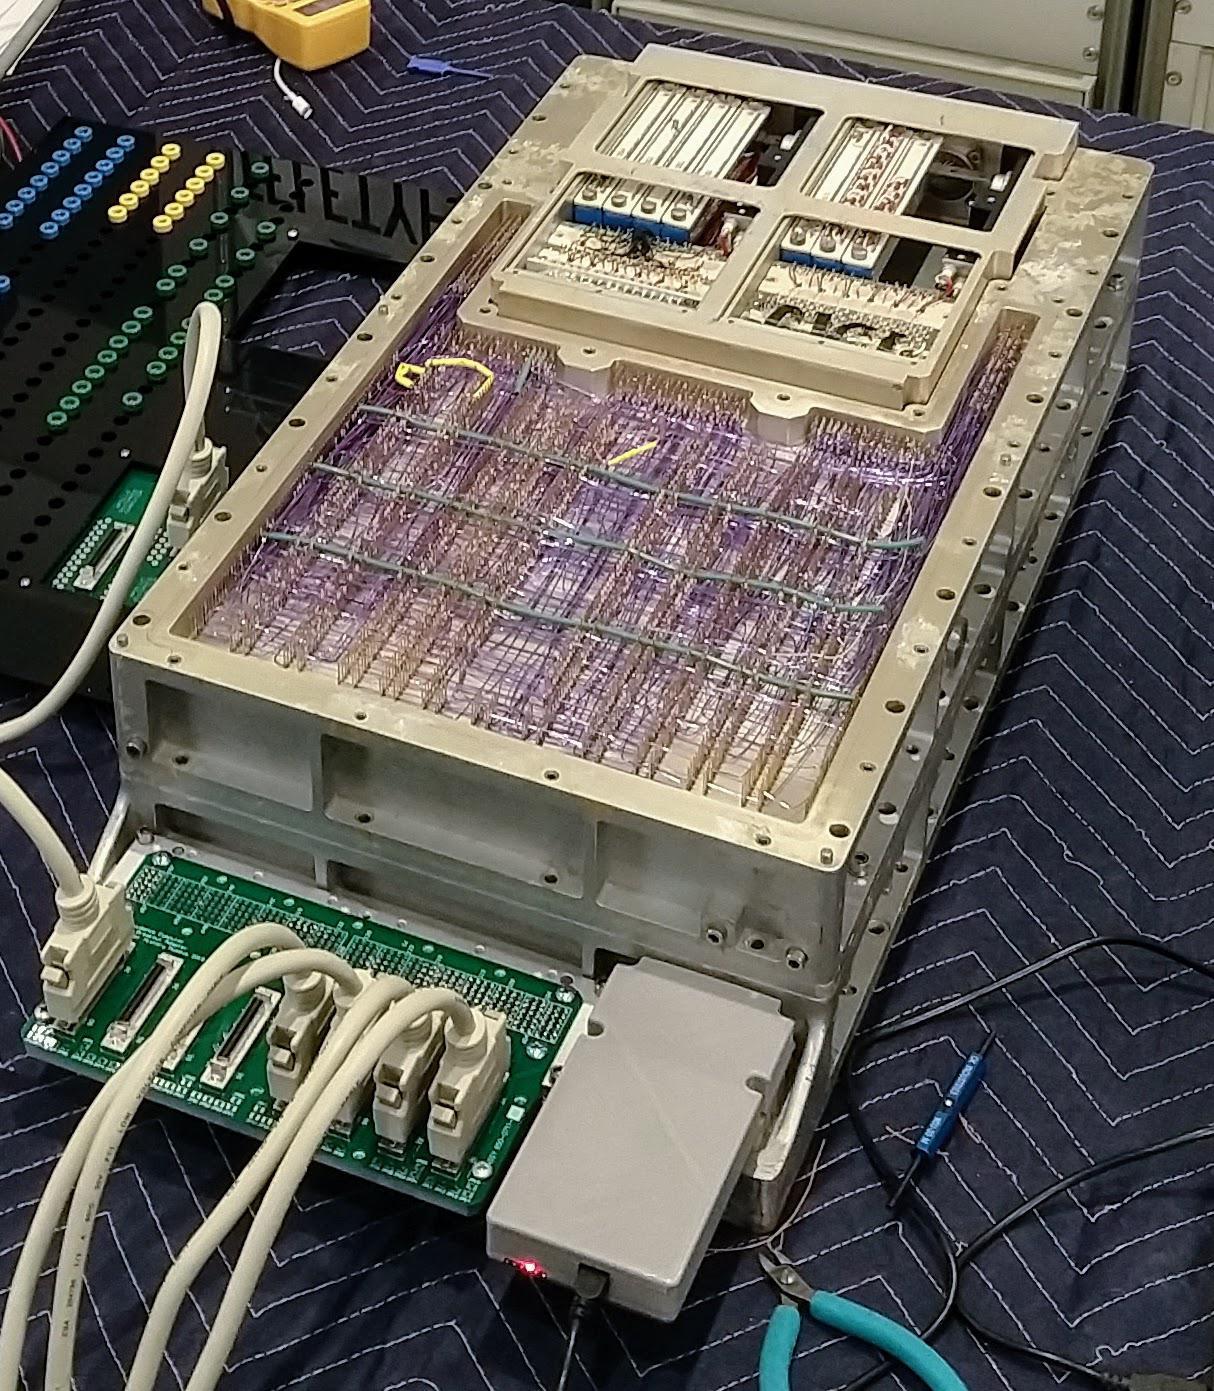 Bitcoin mining on an Apollo Guidance Computer: 10 3 seconds